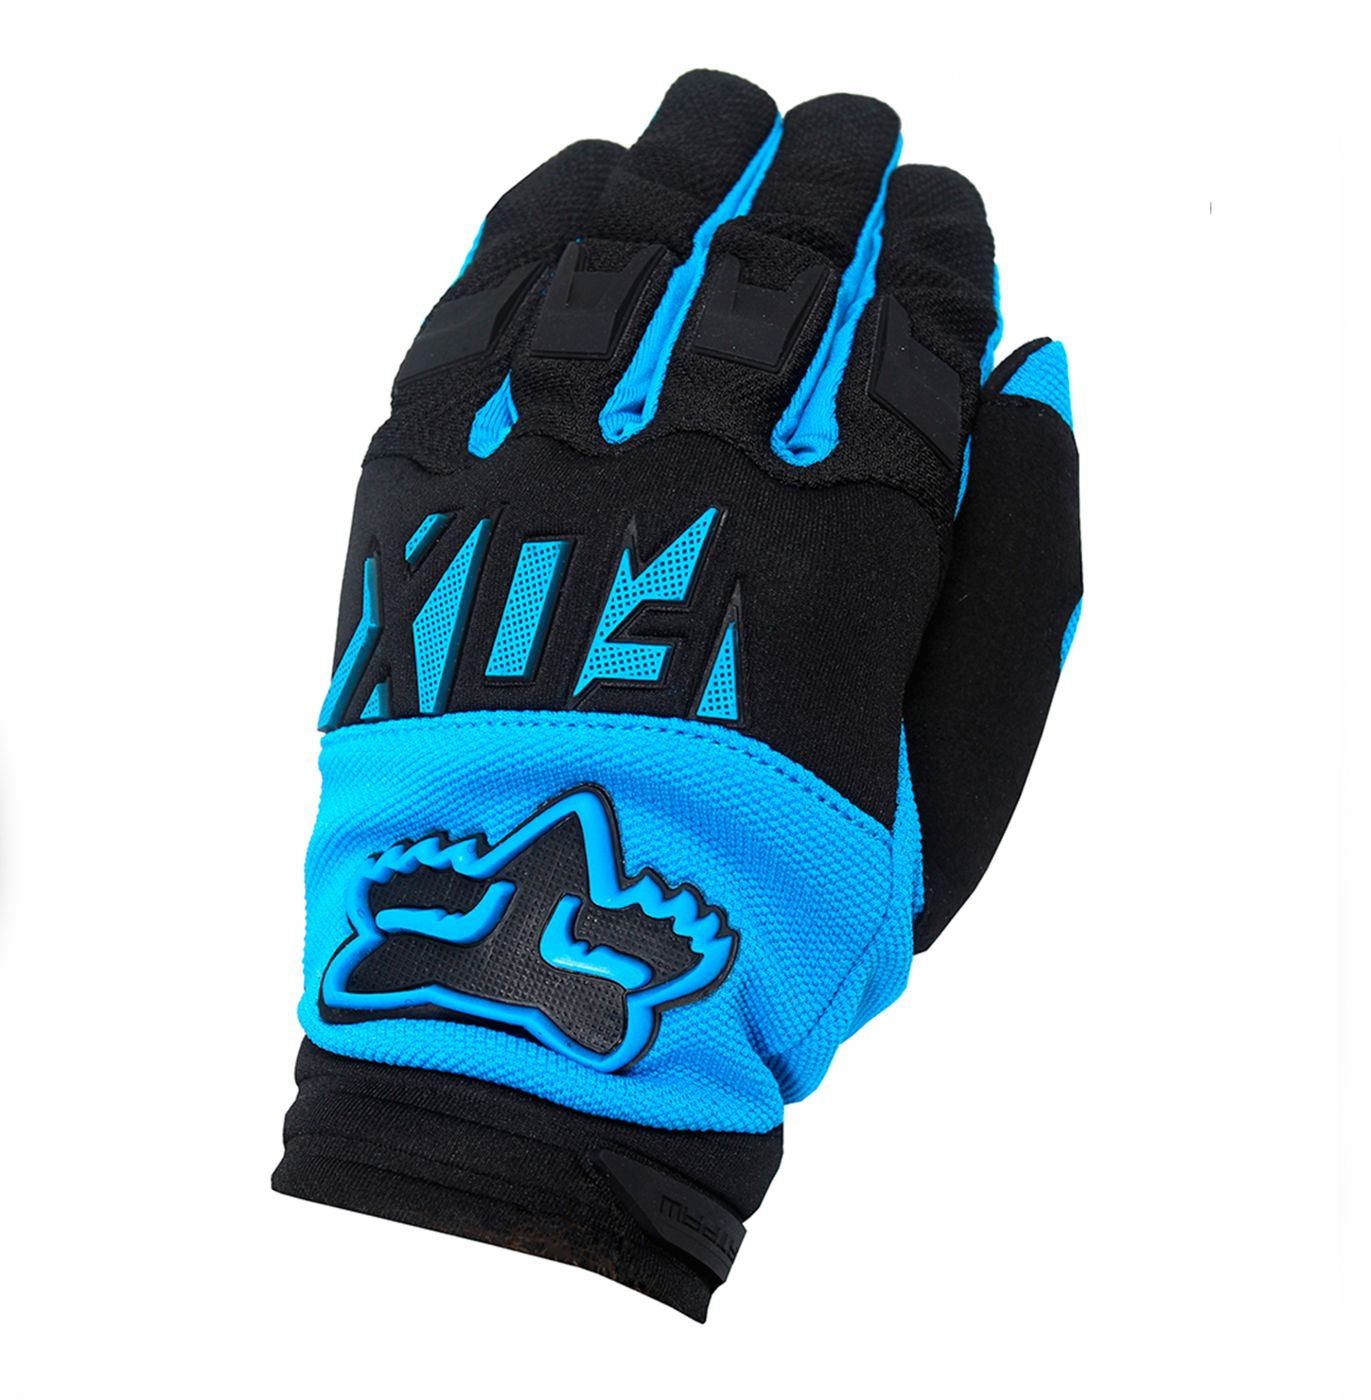 Fox Blue Black  перчатки взрослые